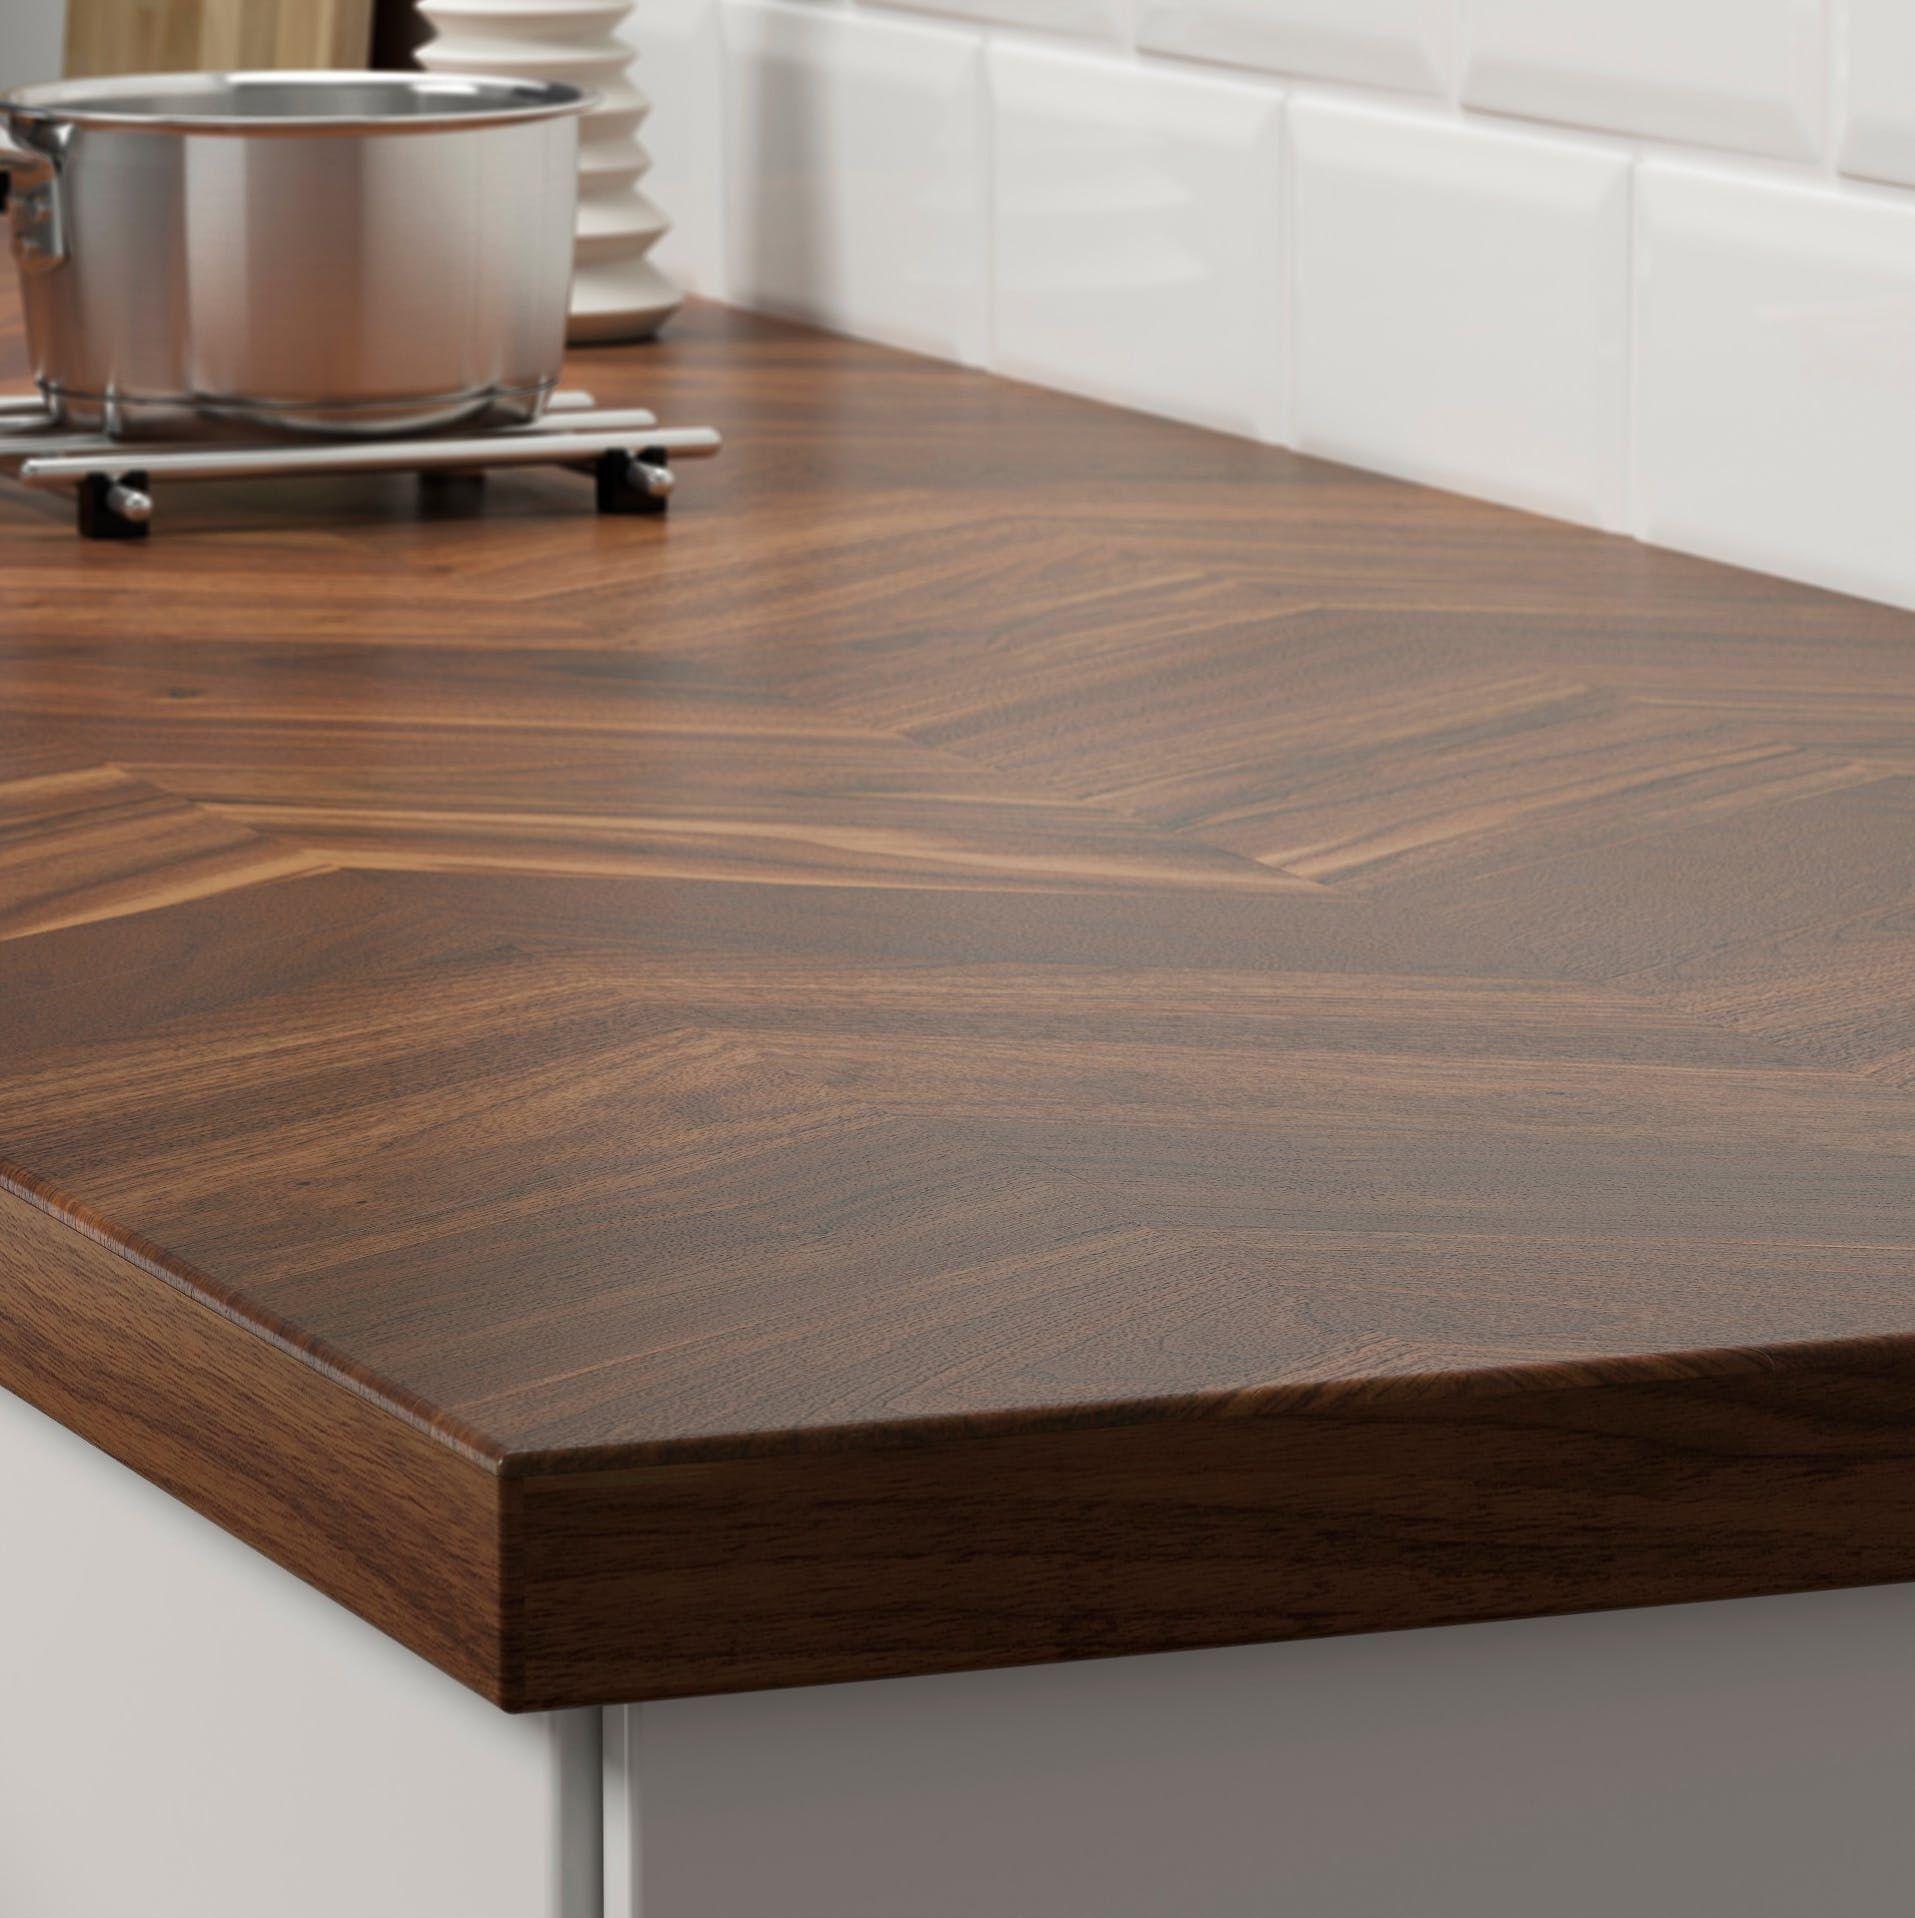 9 Barkaboda Wood Countertop With Images Karlby Countertop